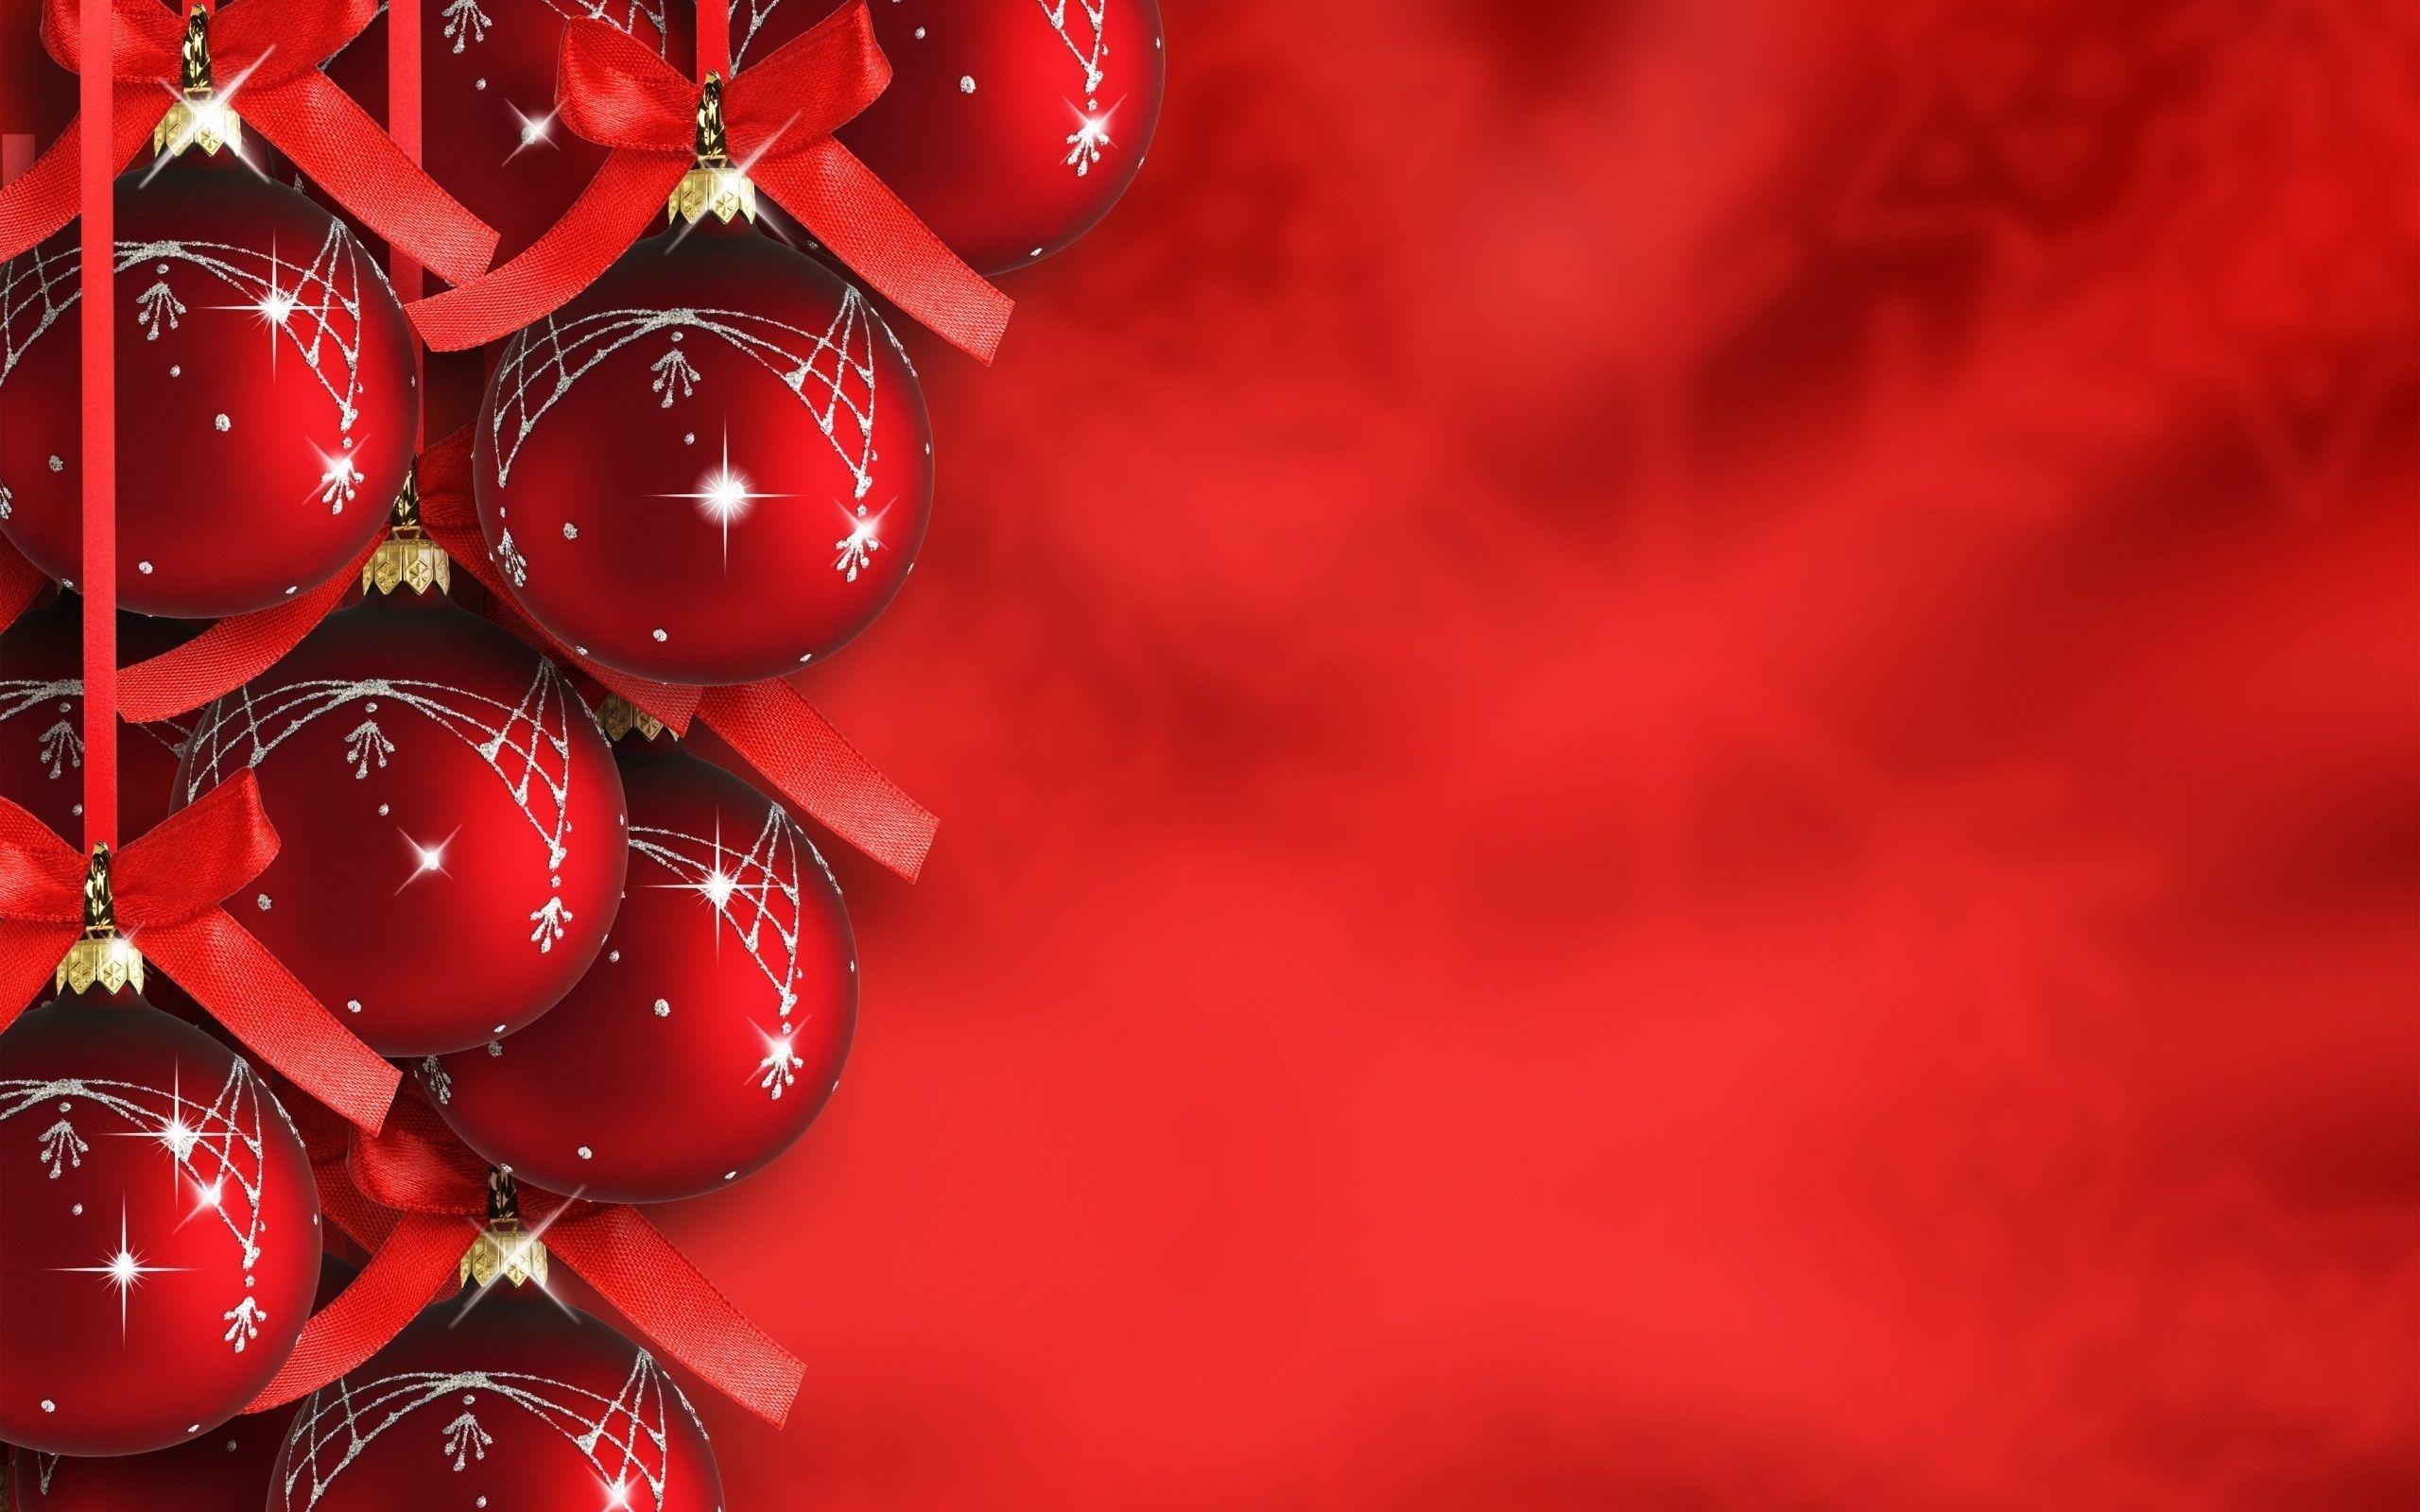 Good Wallpaper High Resolution Christmas - f258930c698fa877b25e53103d91e3c5  Perfect Image Reference_16732.jpg